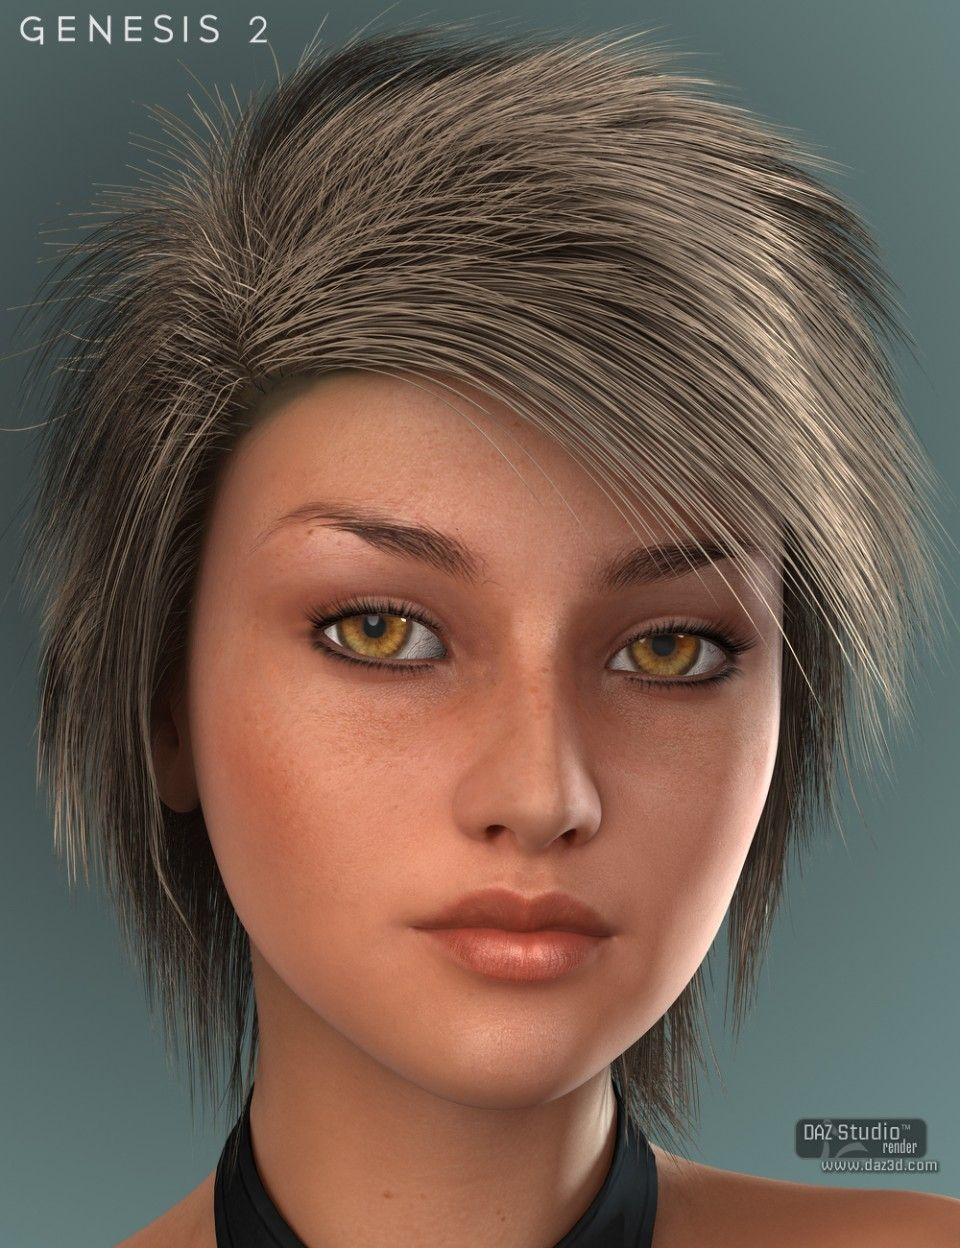 Charlie Hair For Genesis 2 Female S Hair Womens Hairstyles Female